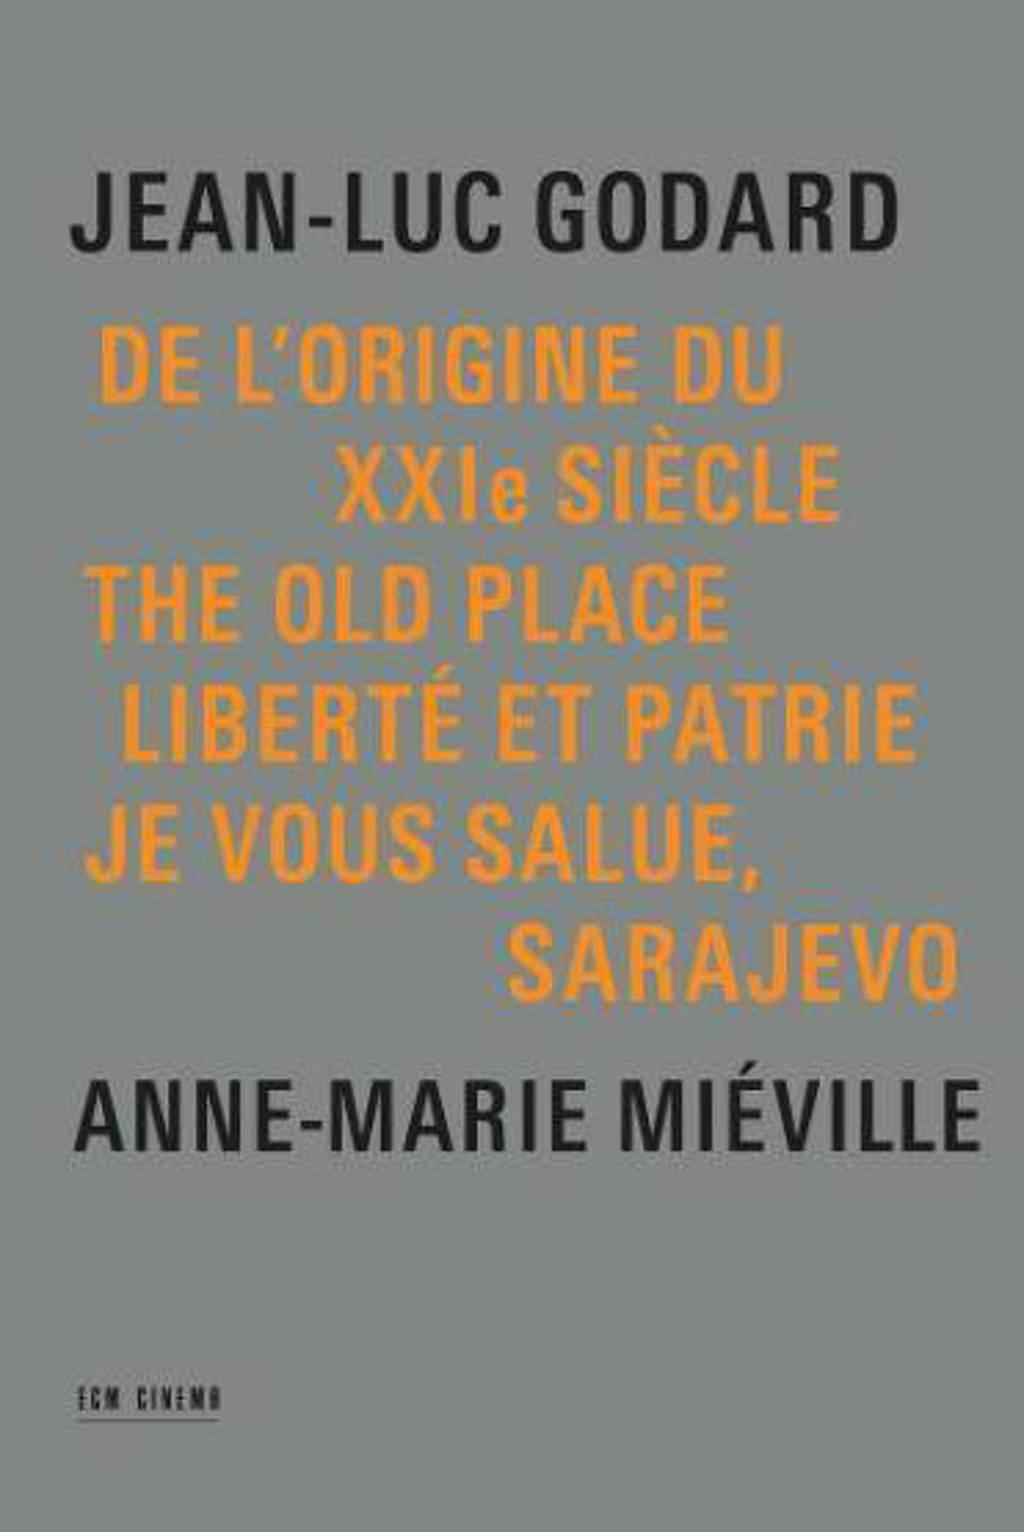 Jean-Luc Godard/ Anne-Marie Mieville - Four Short Films - Book+Dvd (DVD)